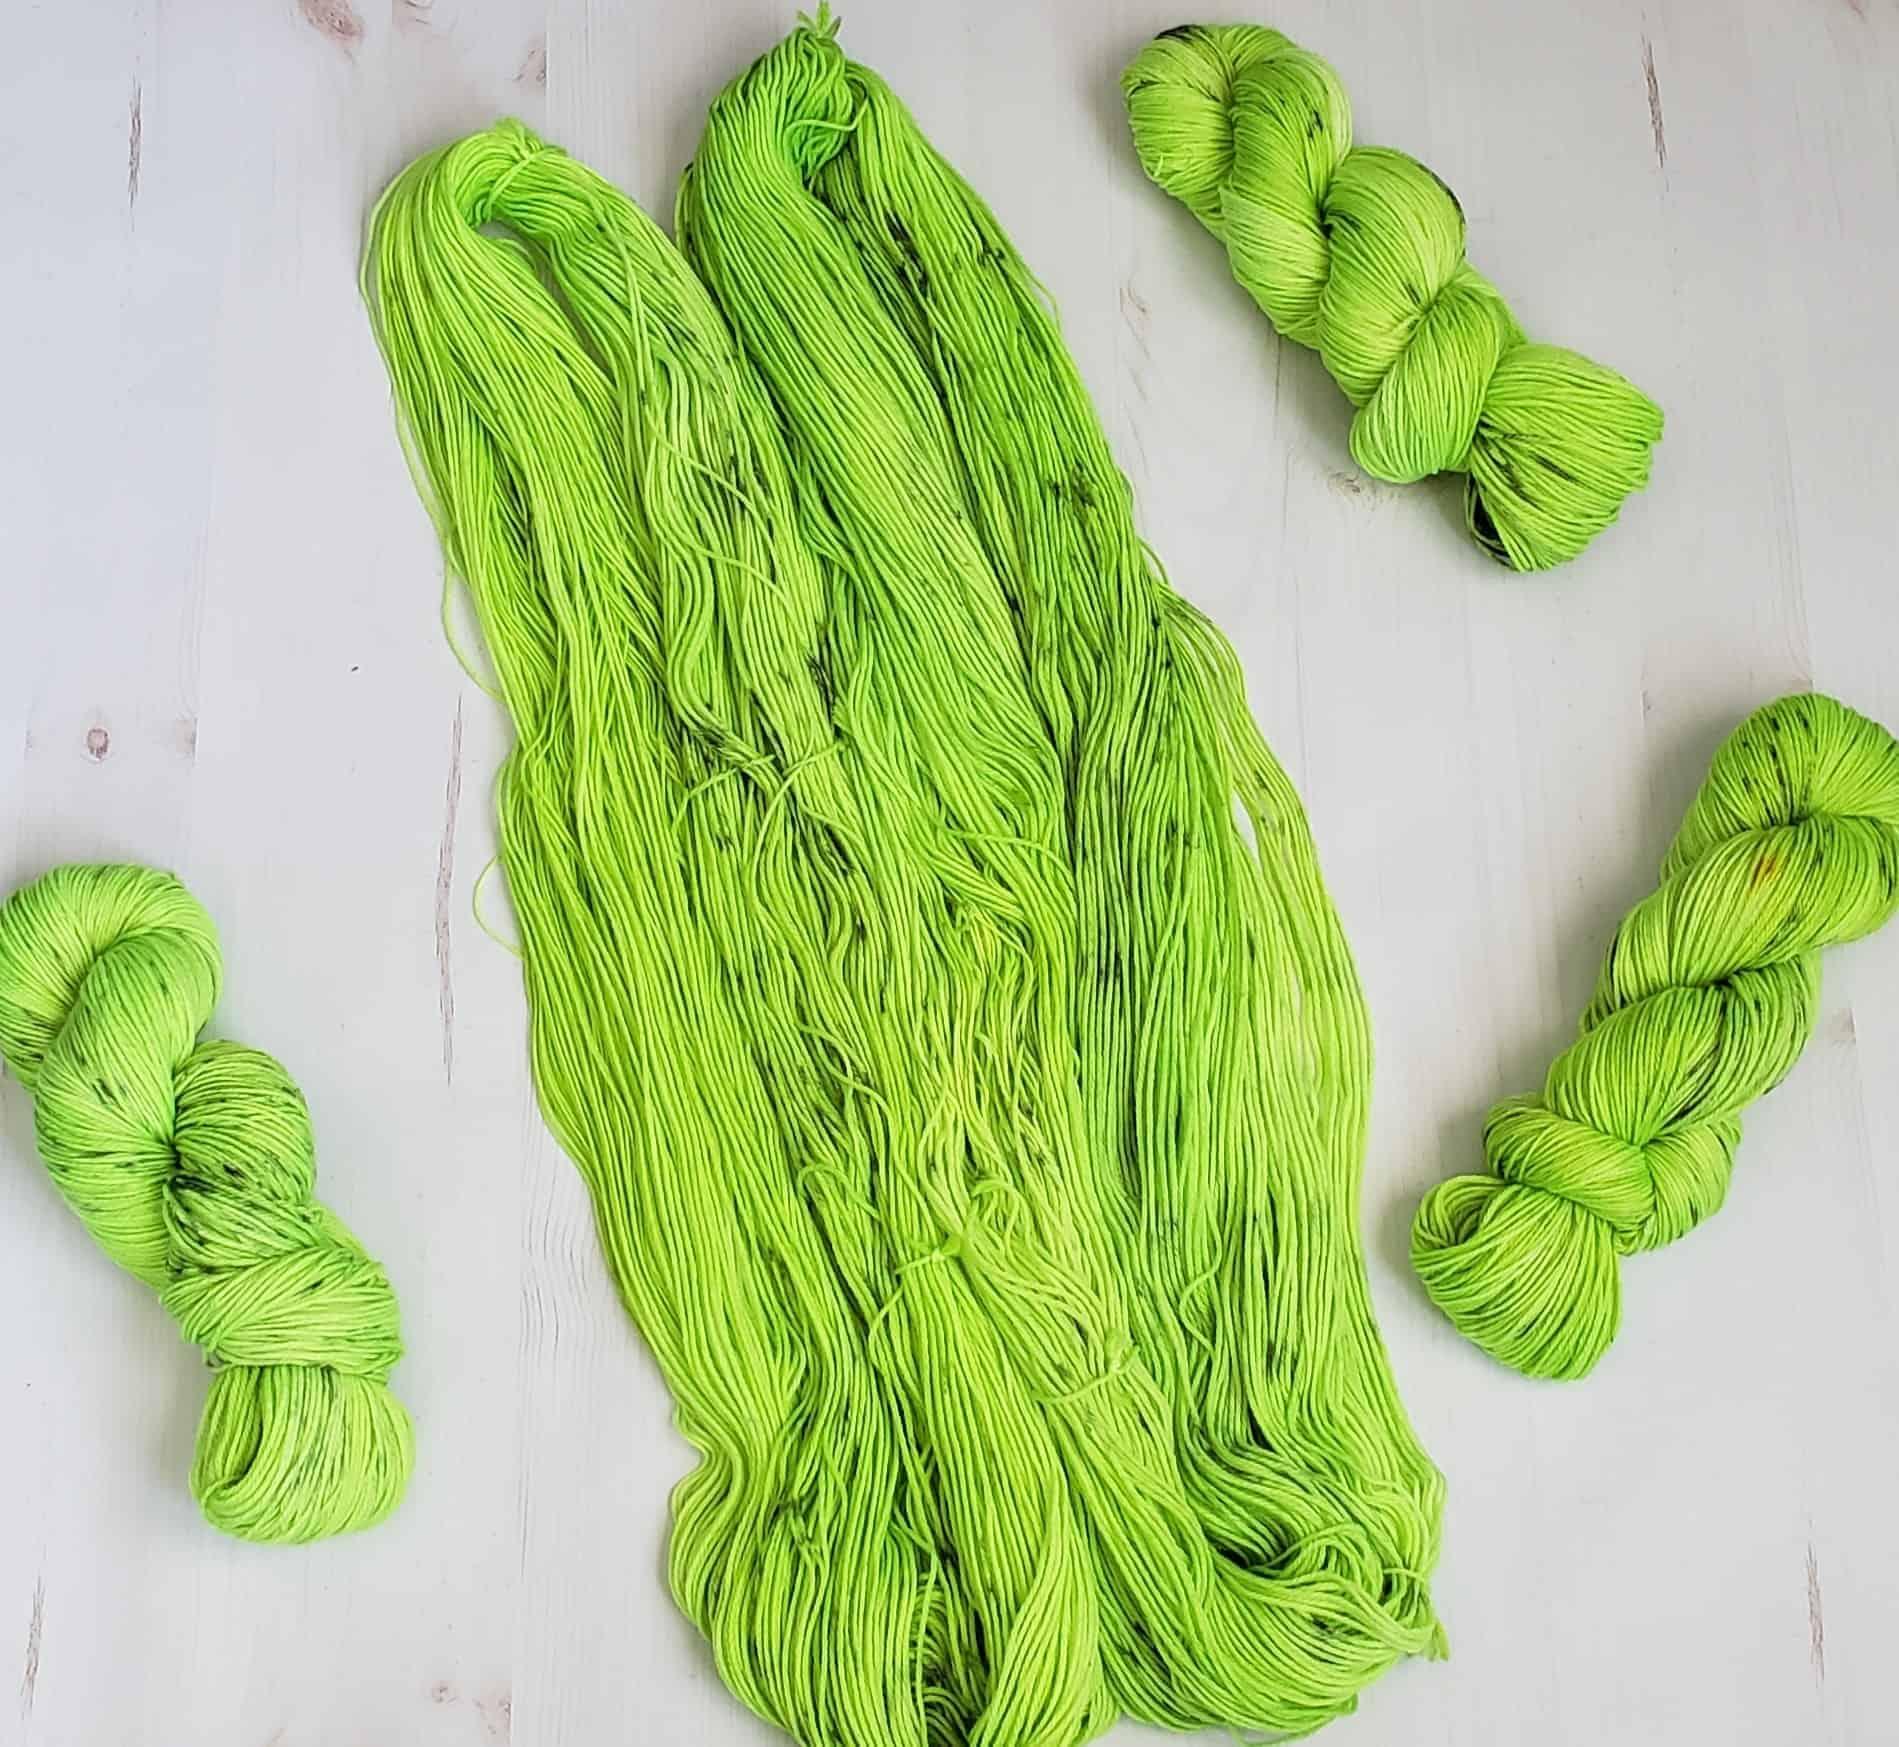 Untwisted skeins of neon green yarn.